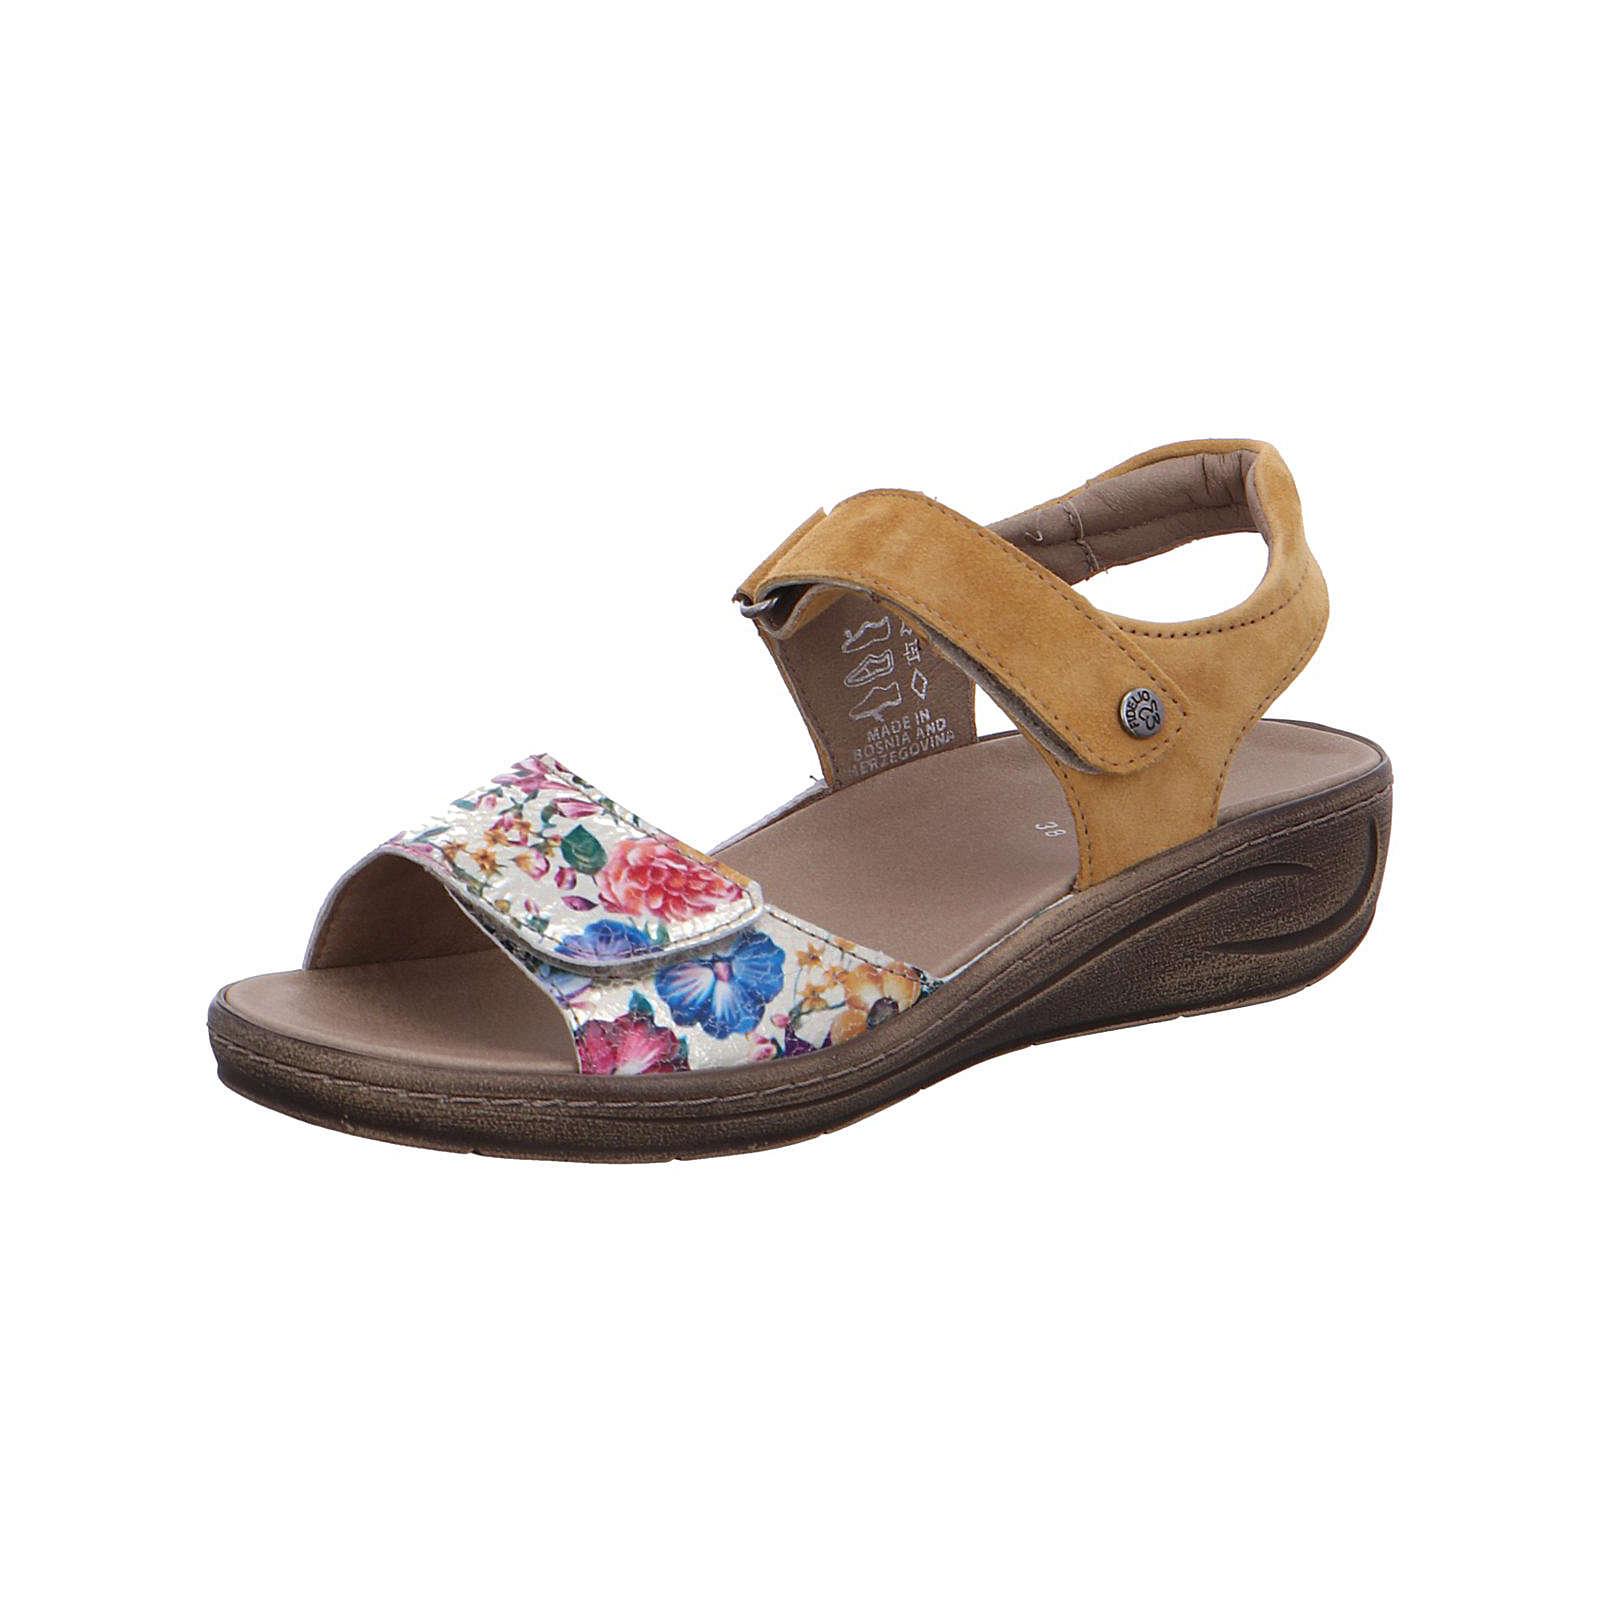 Fidelio Sandalen Klassische Sandalen beige Damen Gr. 37